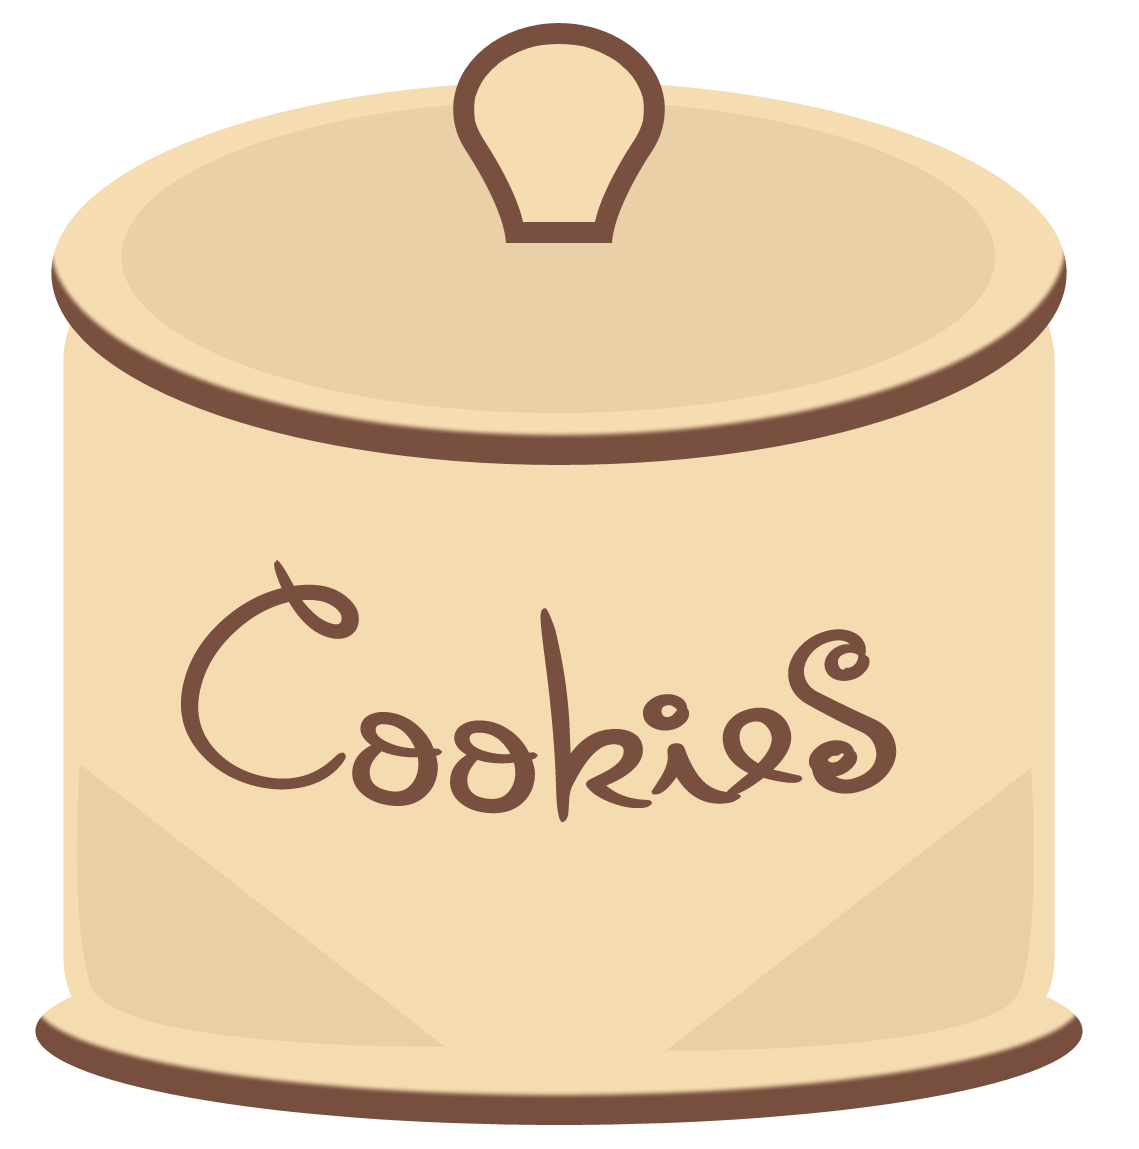 Cookie Jar Clipart Karen Cookie Jar